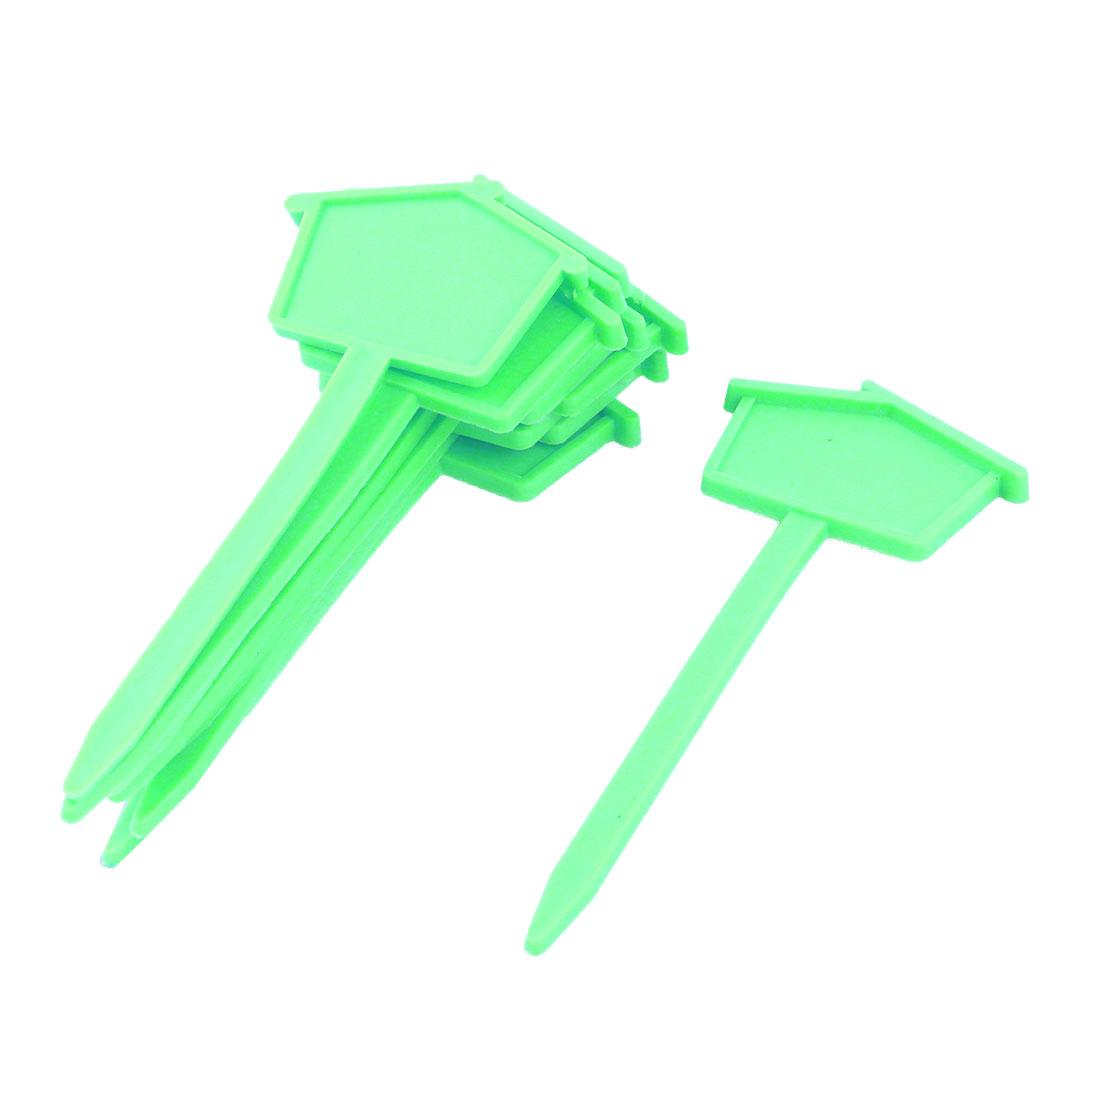 Family Yard Plastic House Design Name Marking Tag Label Green 10pcs